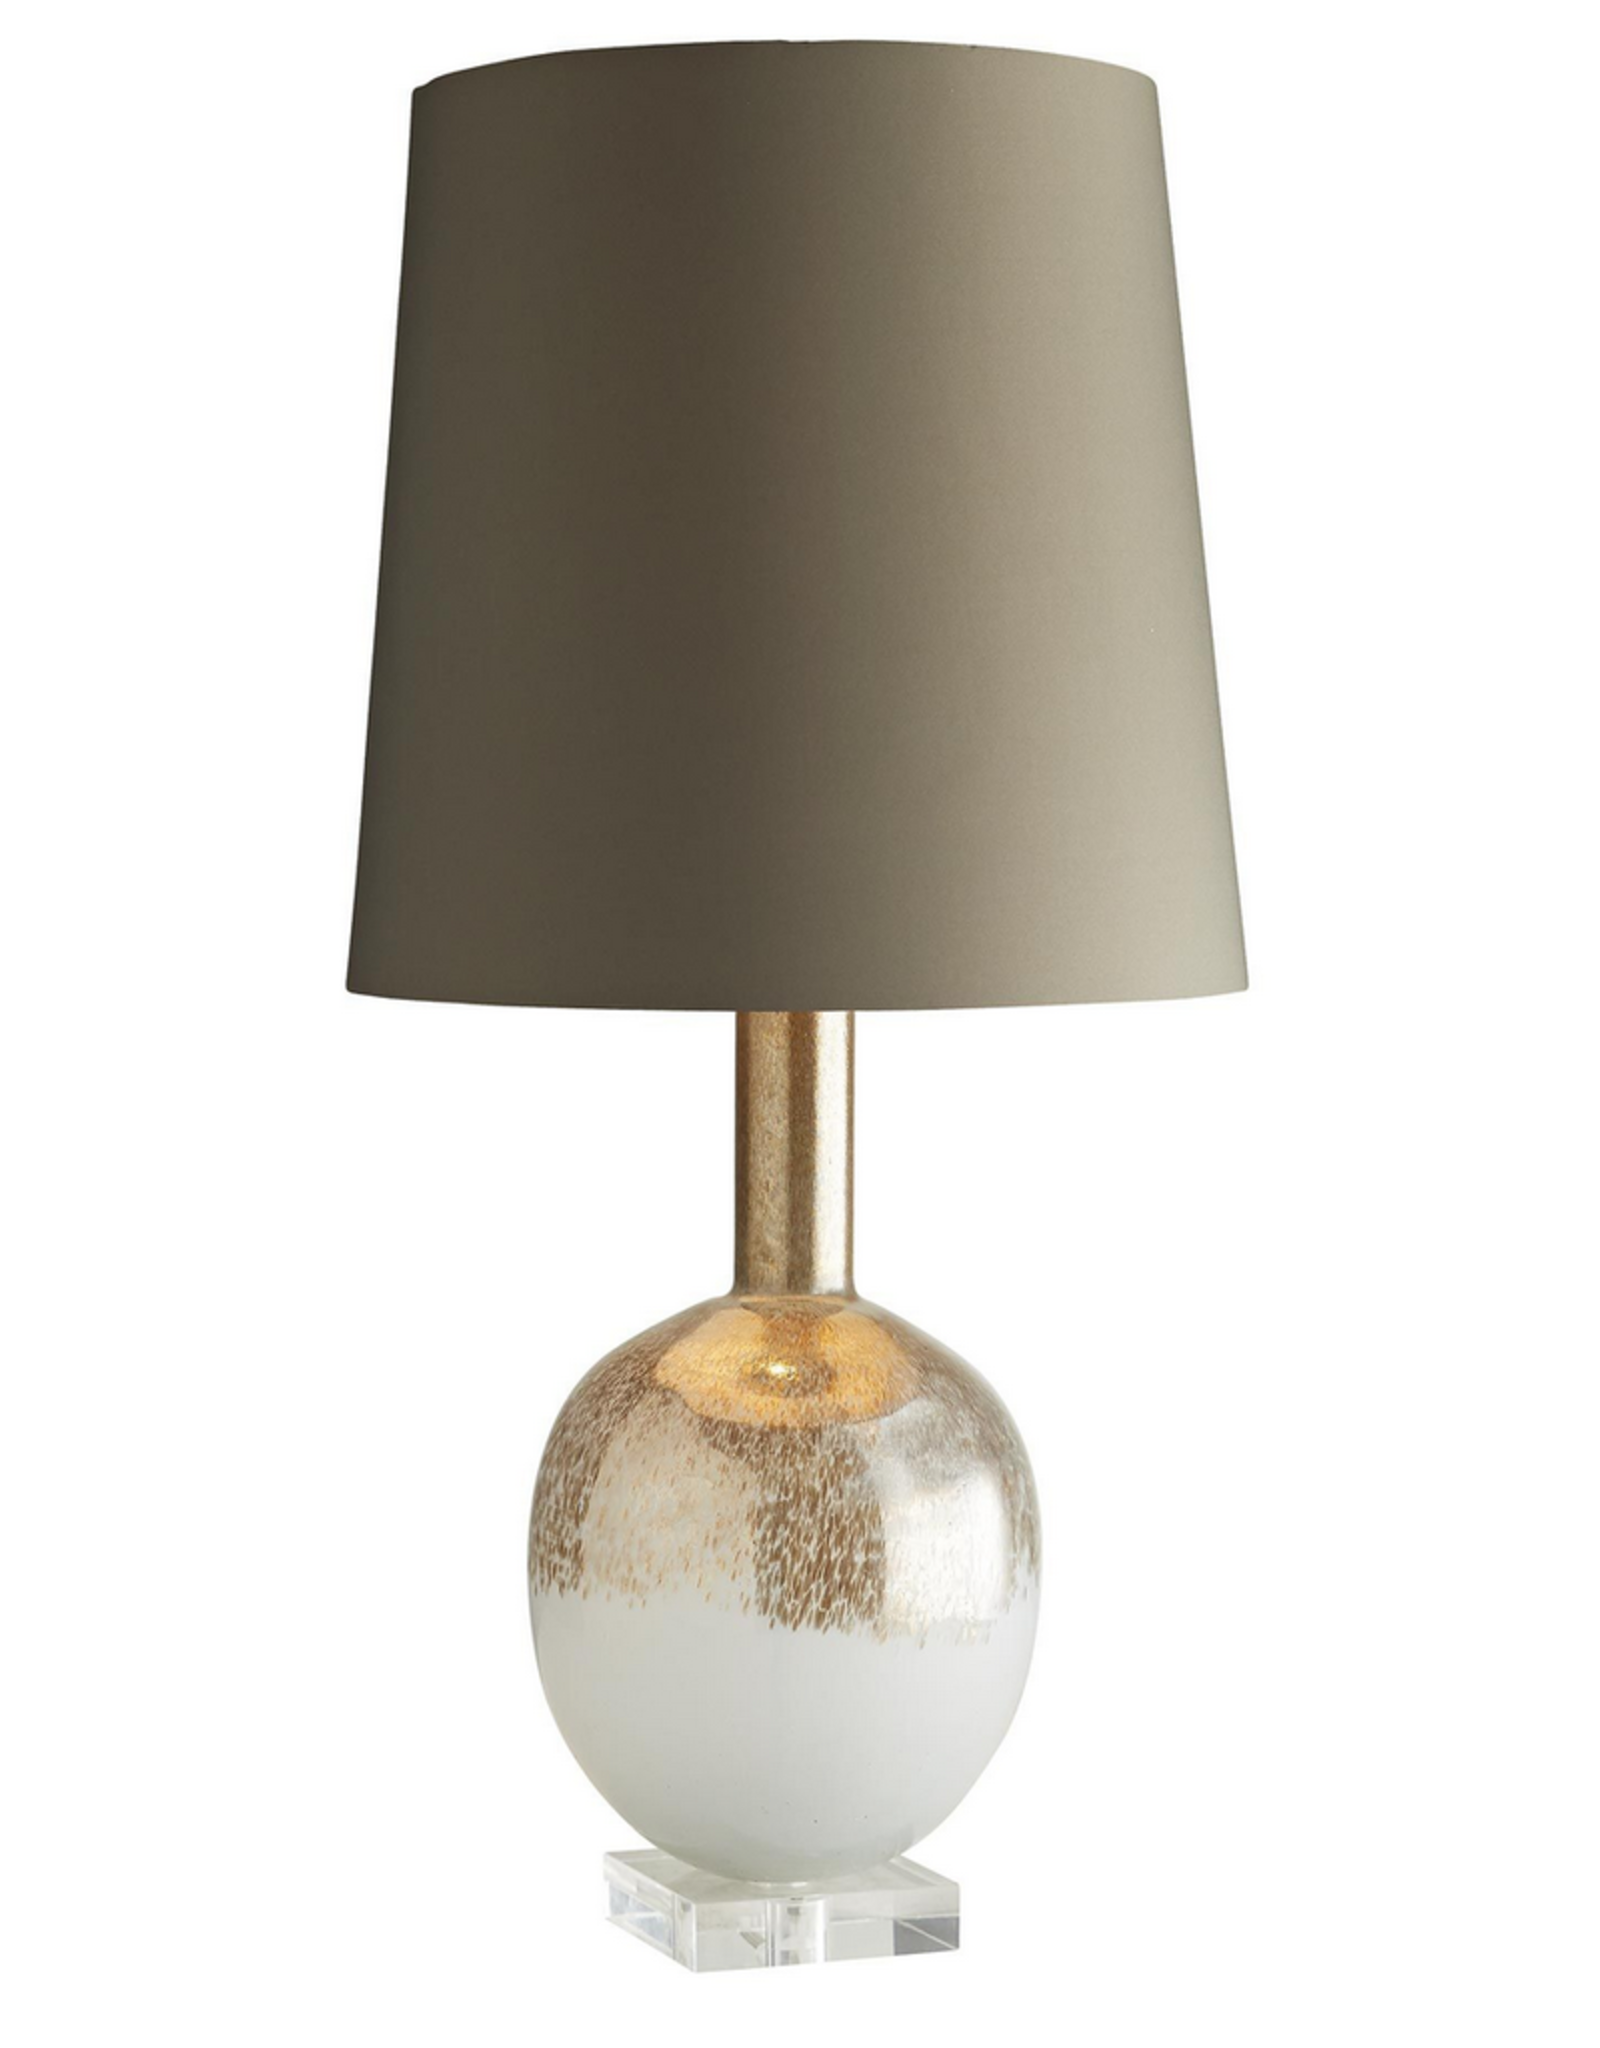 Arteriors Portia Table Lamp